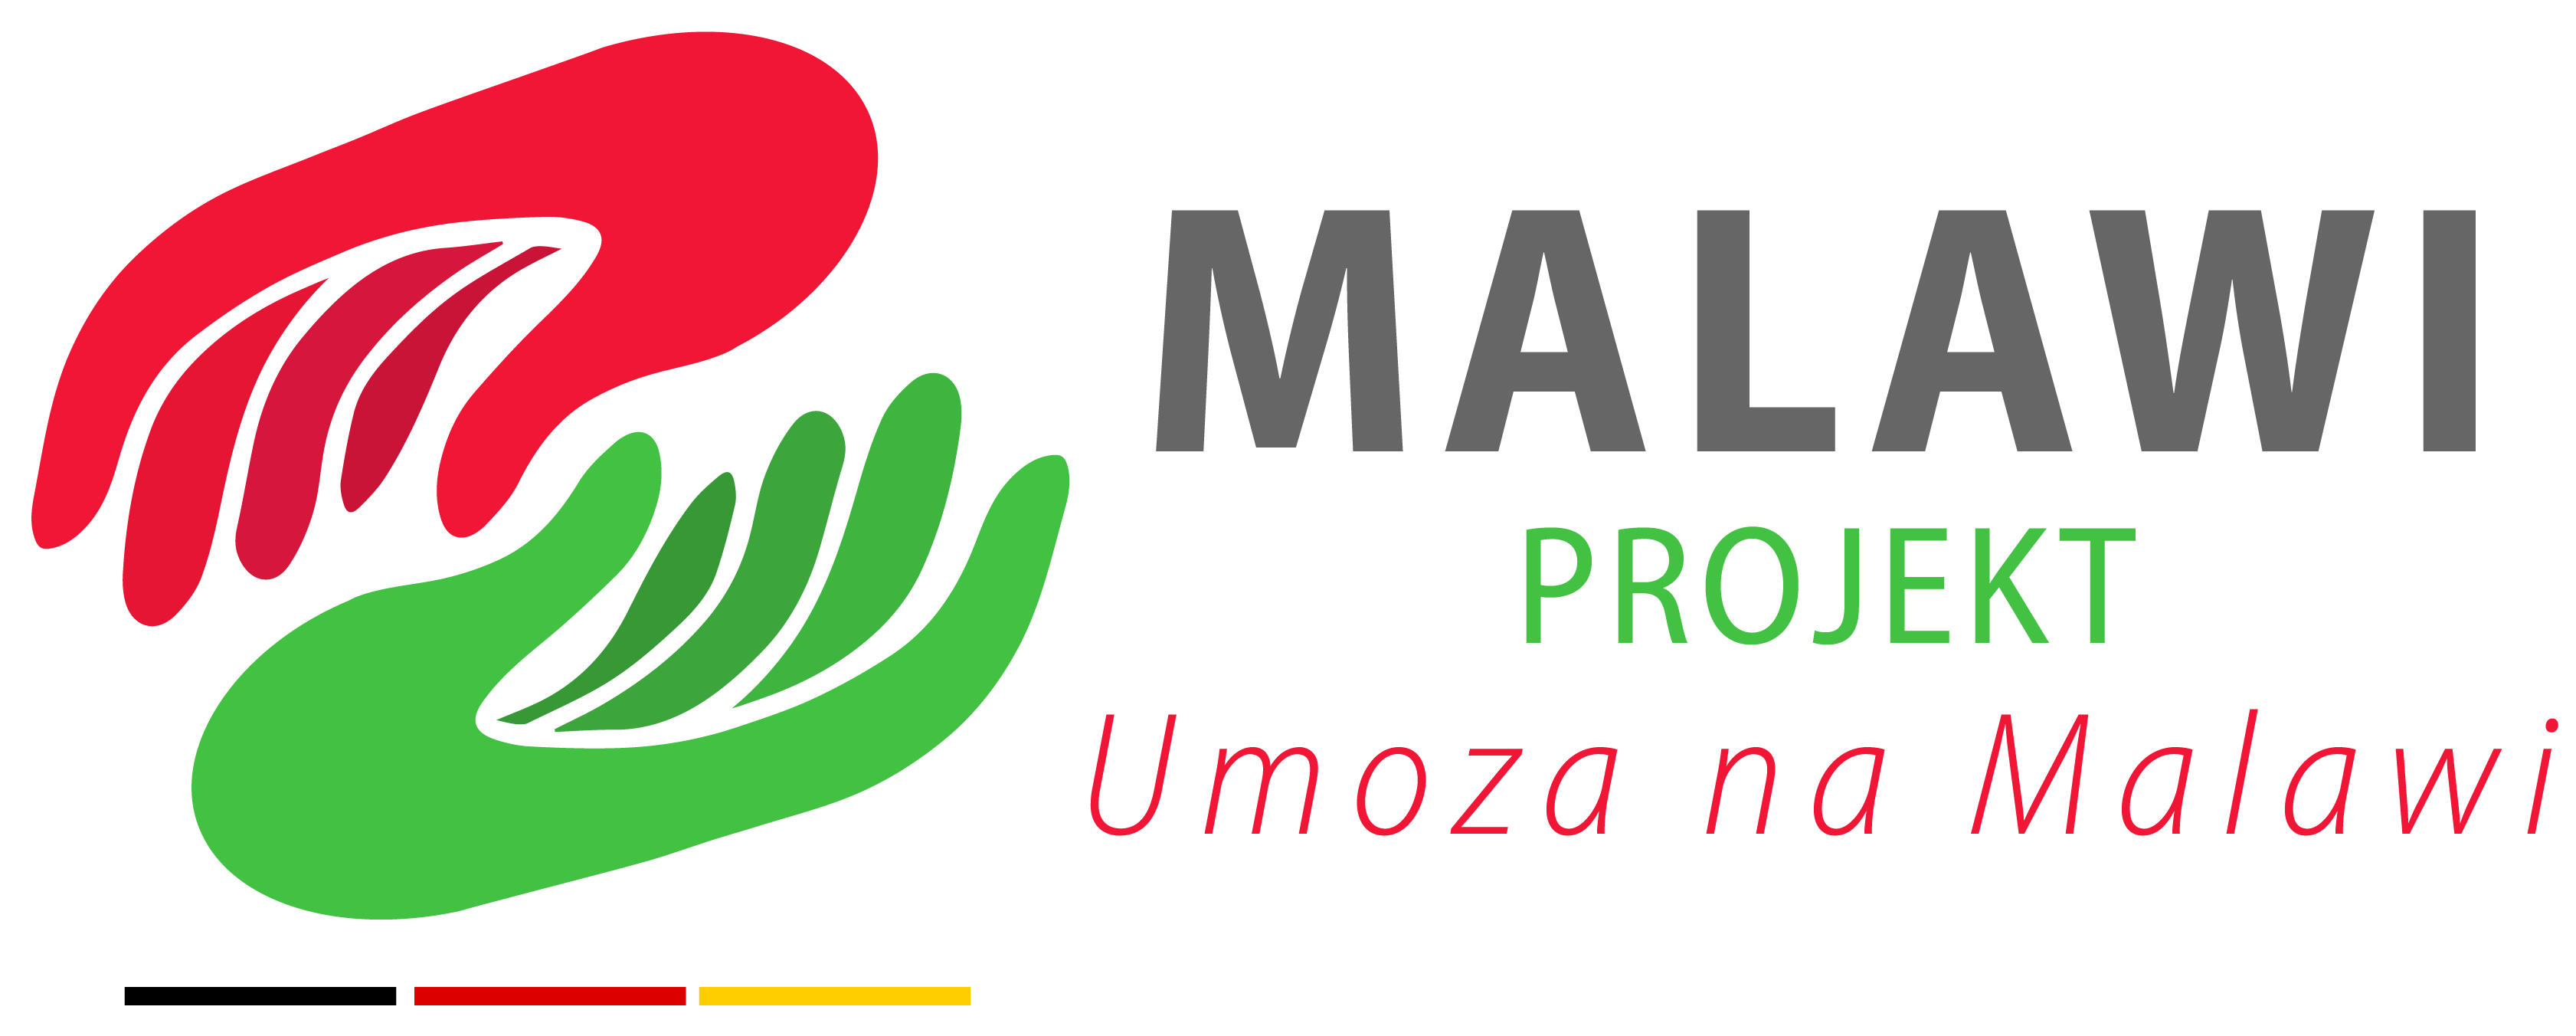 Malawi Projekt